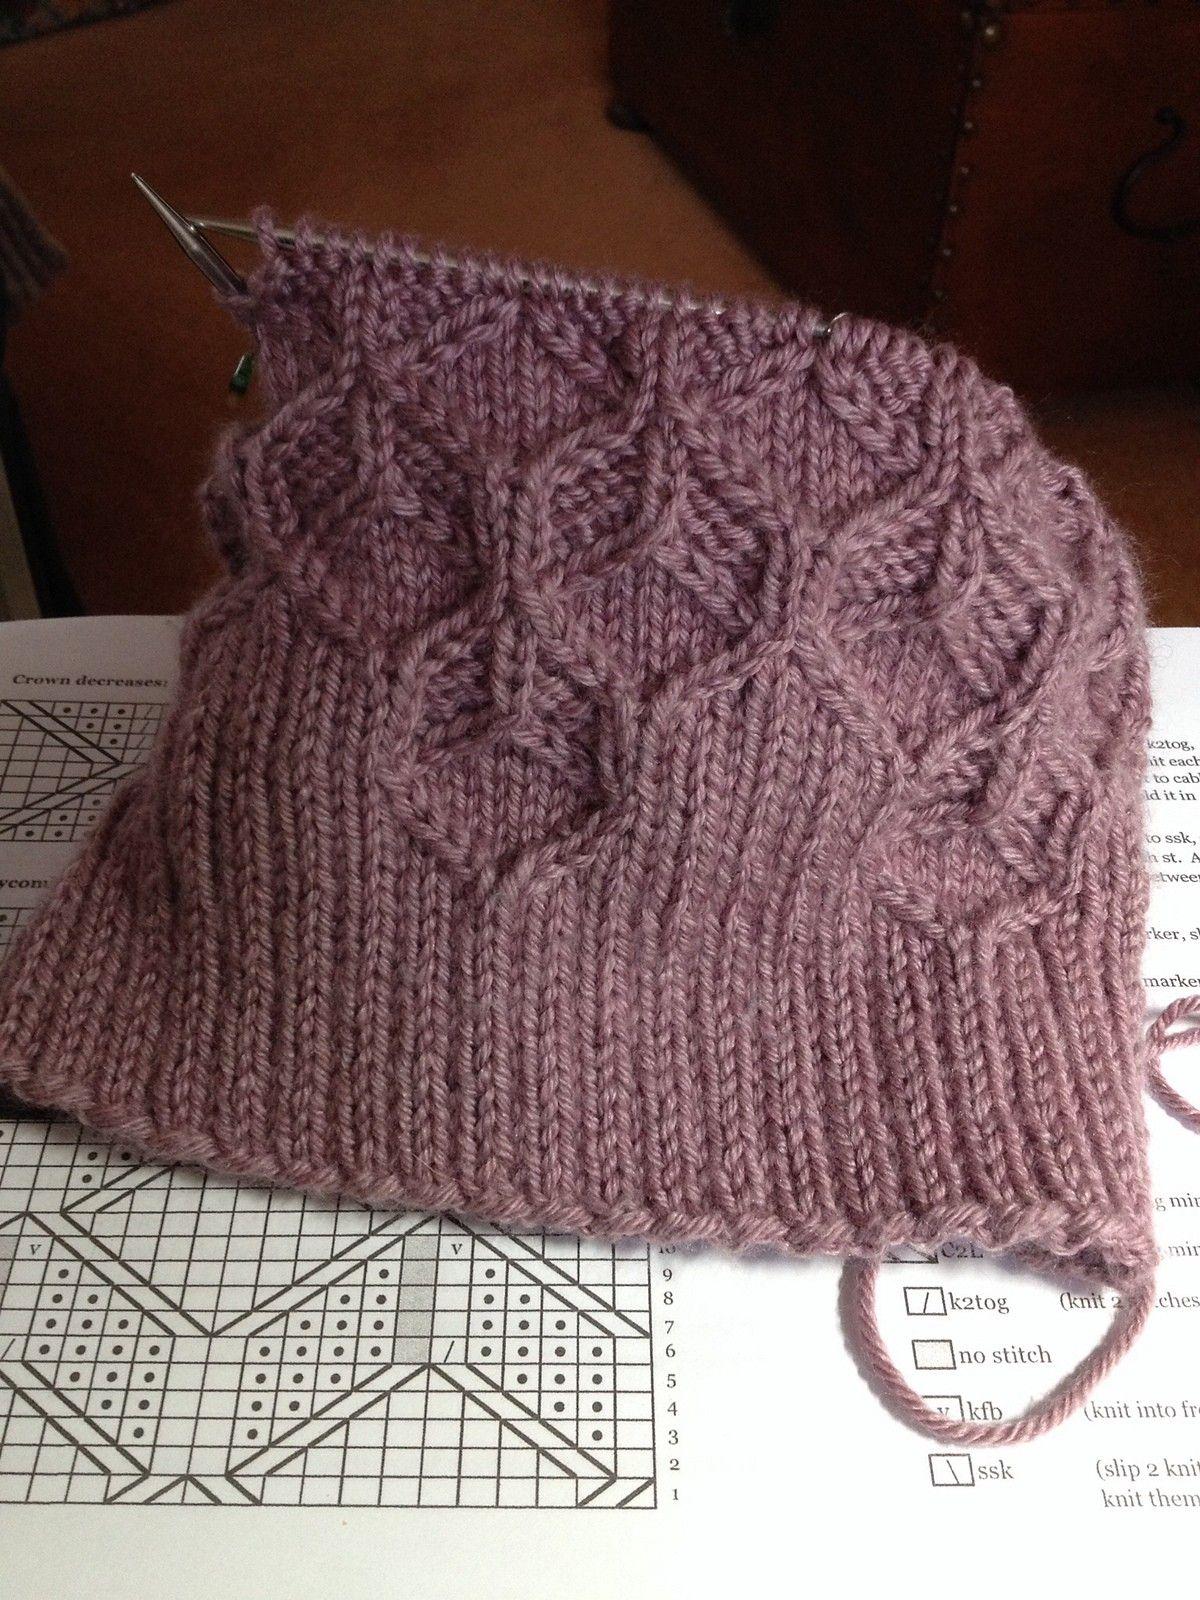 Pin By Vira Slavina On Pinterest Knitting Stitches